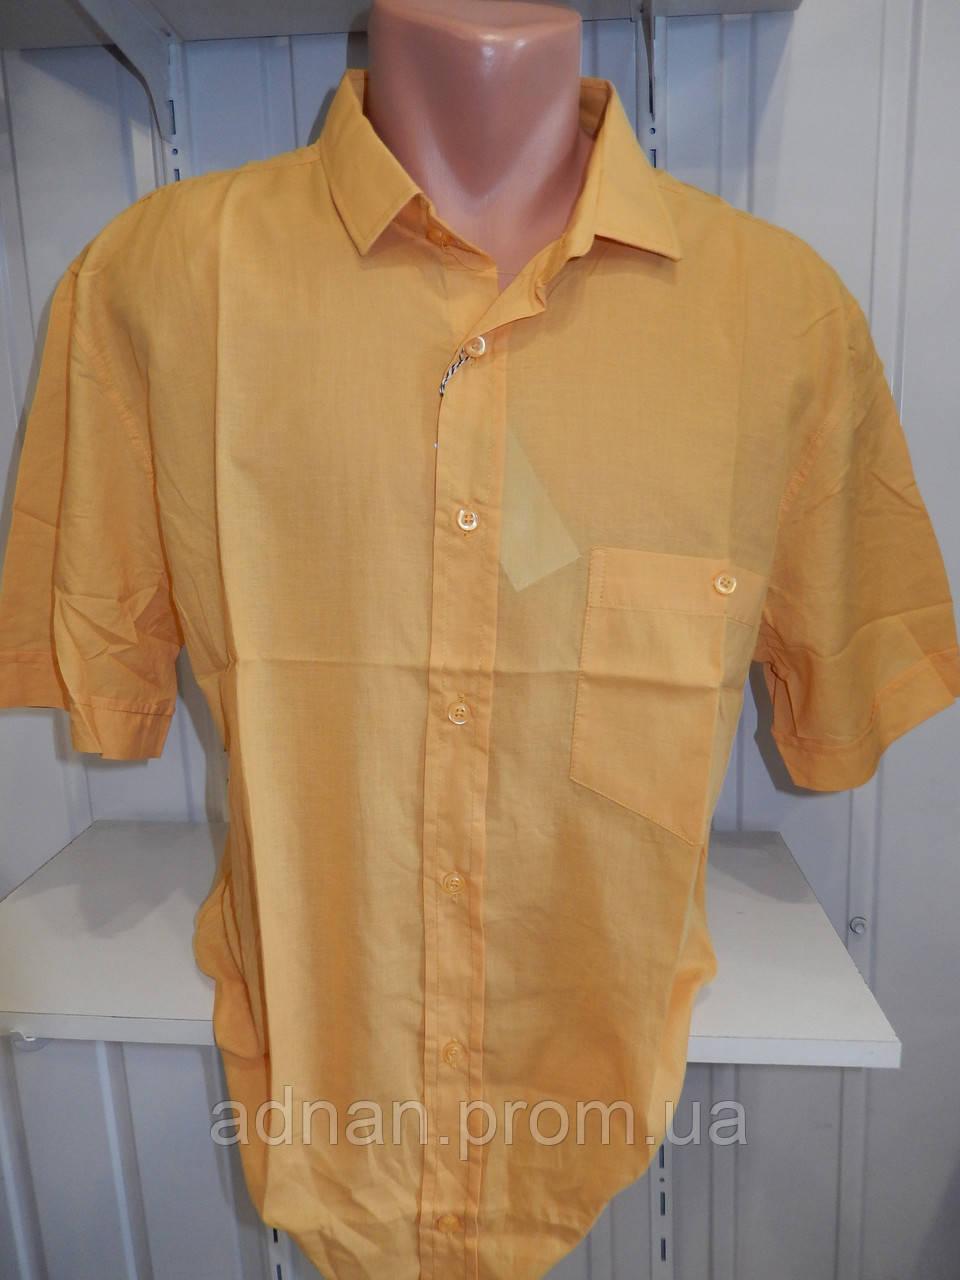 Рубашка мужская HIZZ короткий рукав, батал, однотонная, с карманом 006